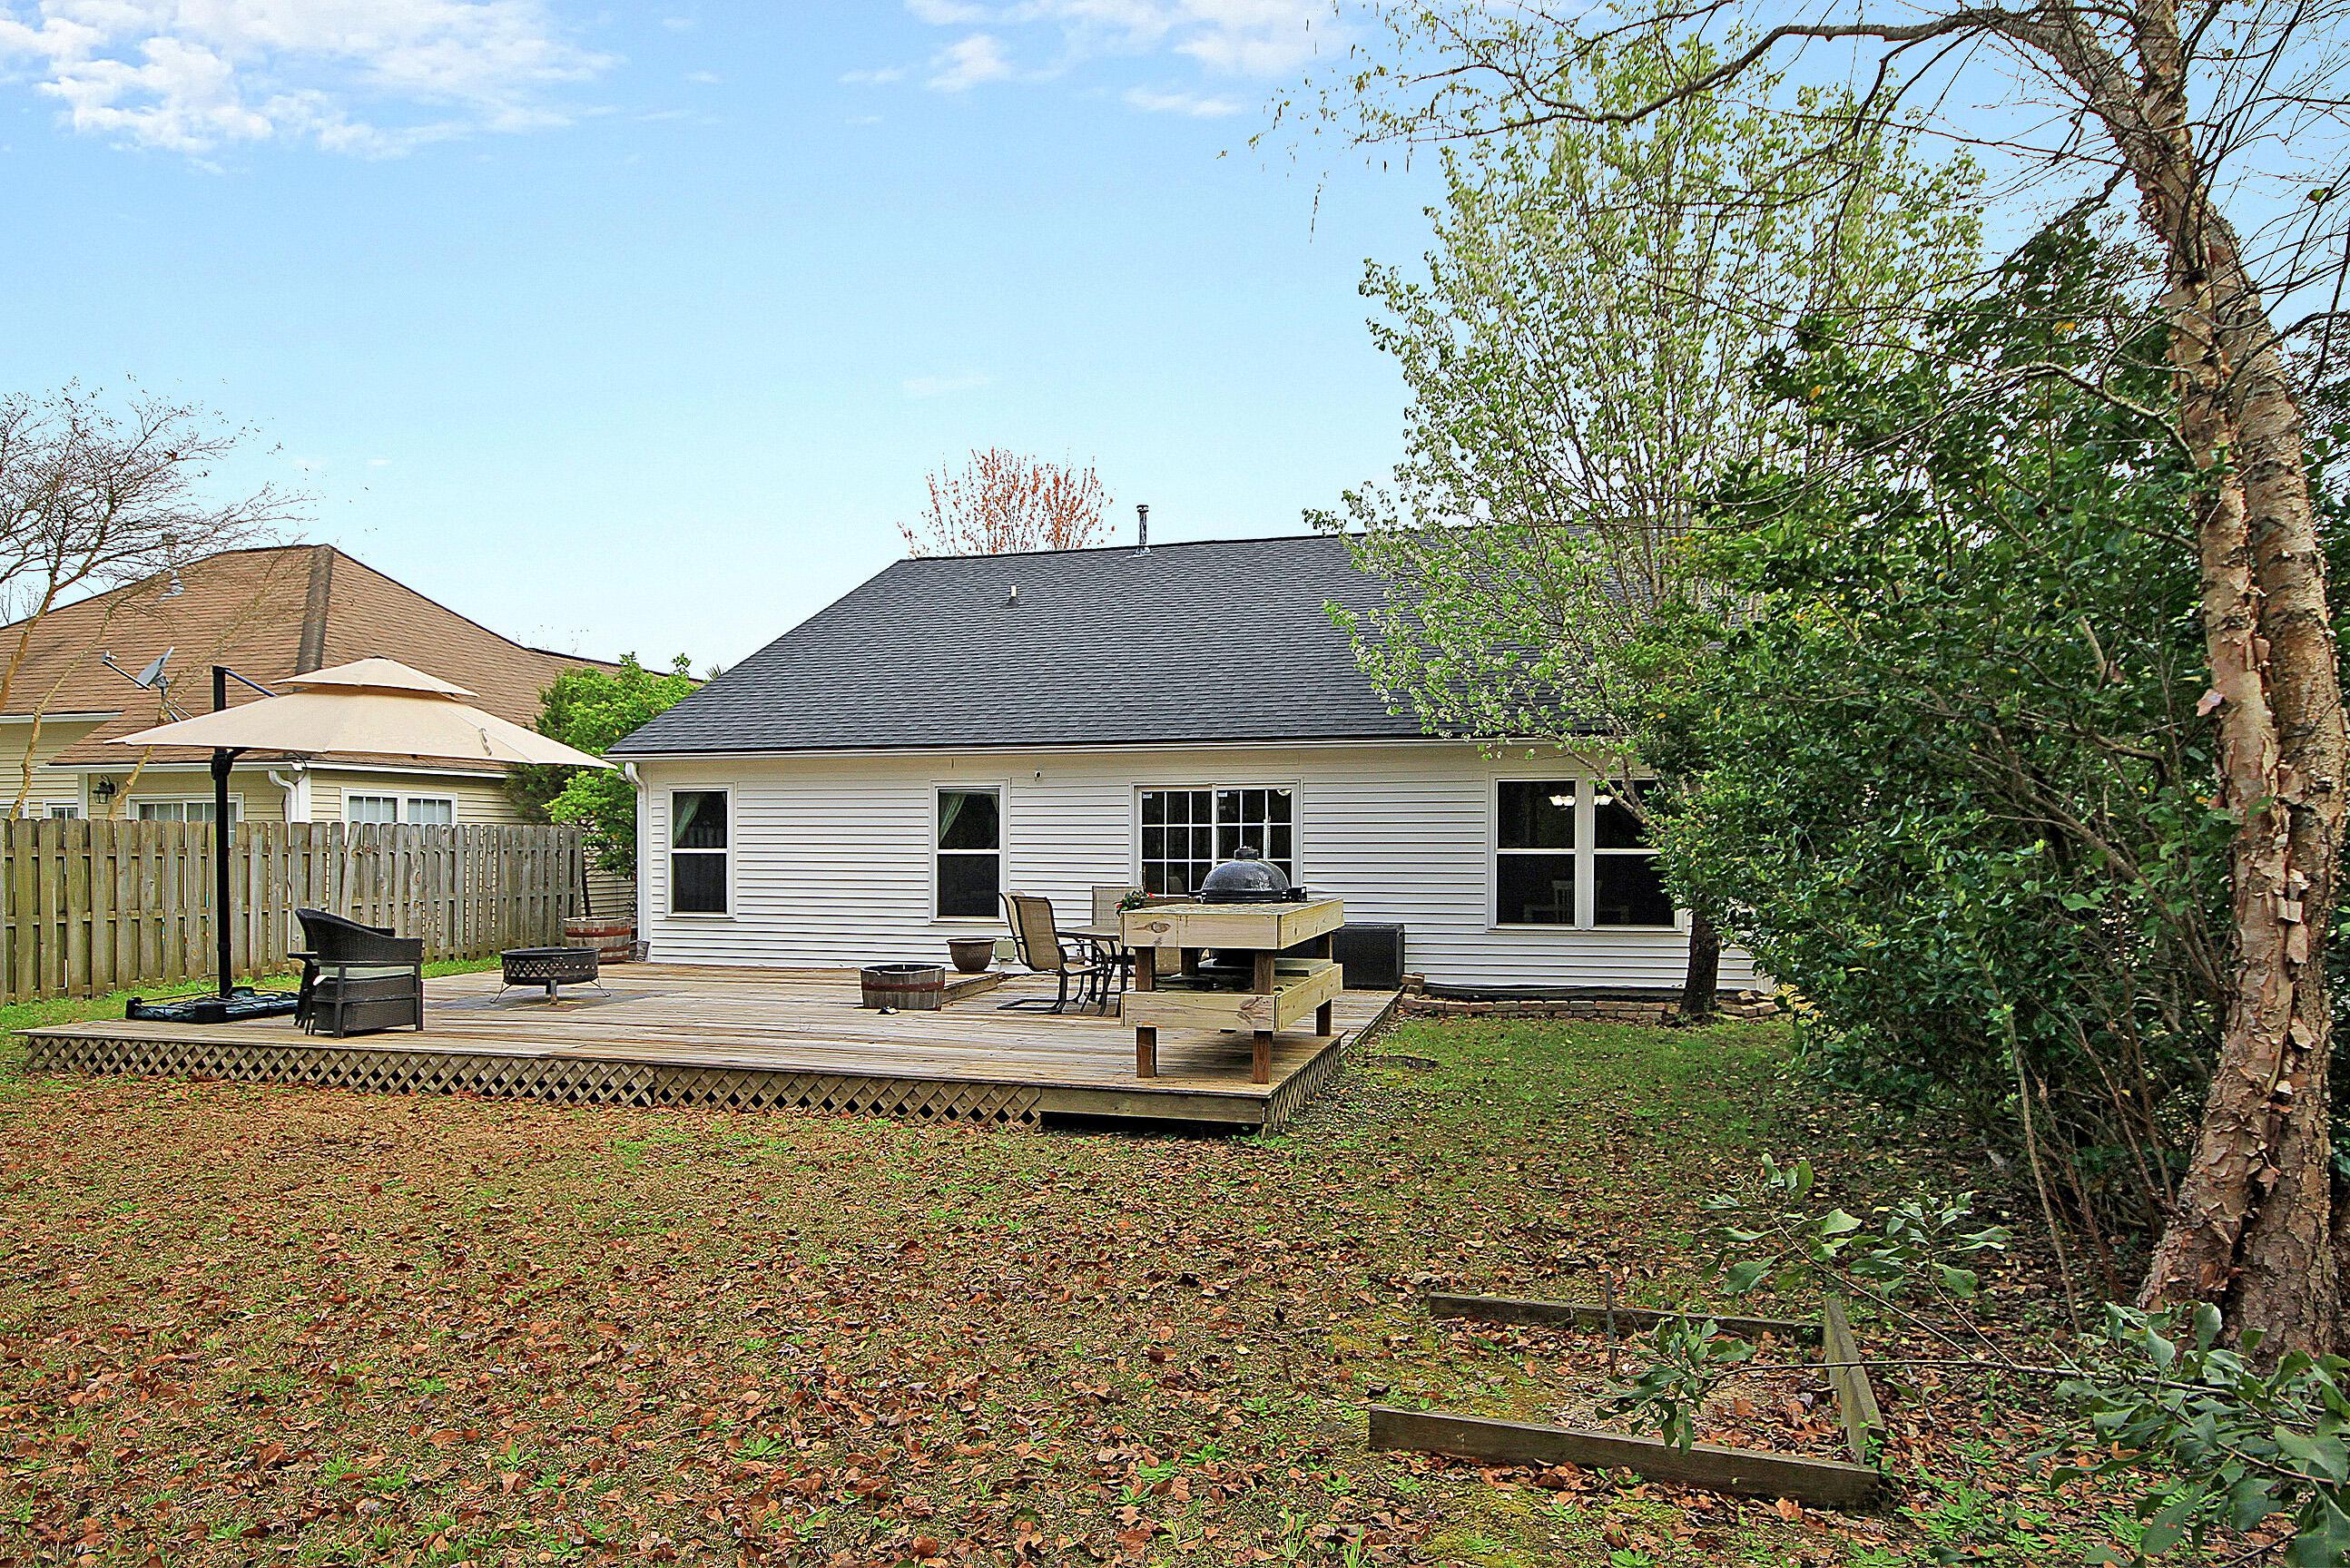 Park West Homes For Sale - 1460 Wellesley, Mount Pleasant, SC - 16